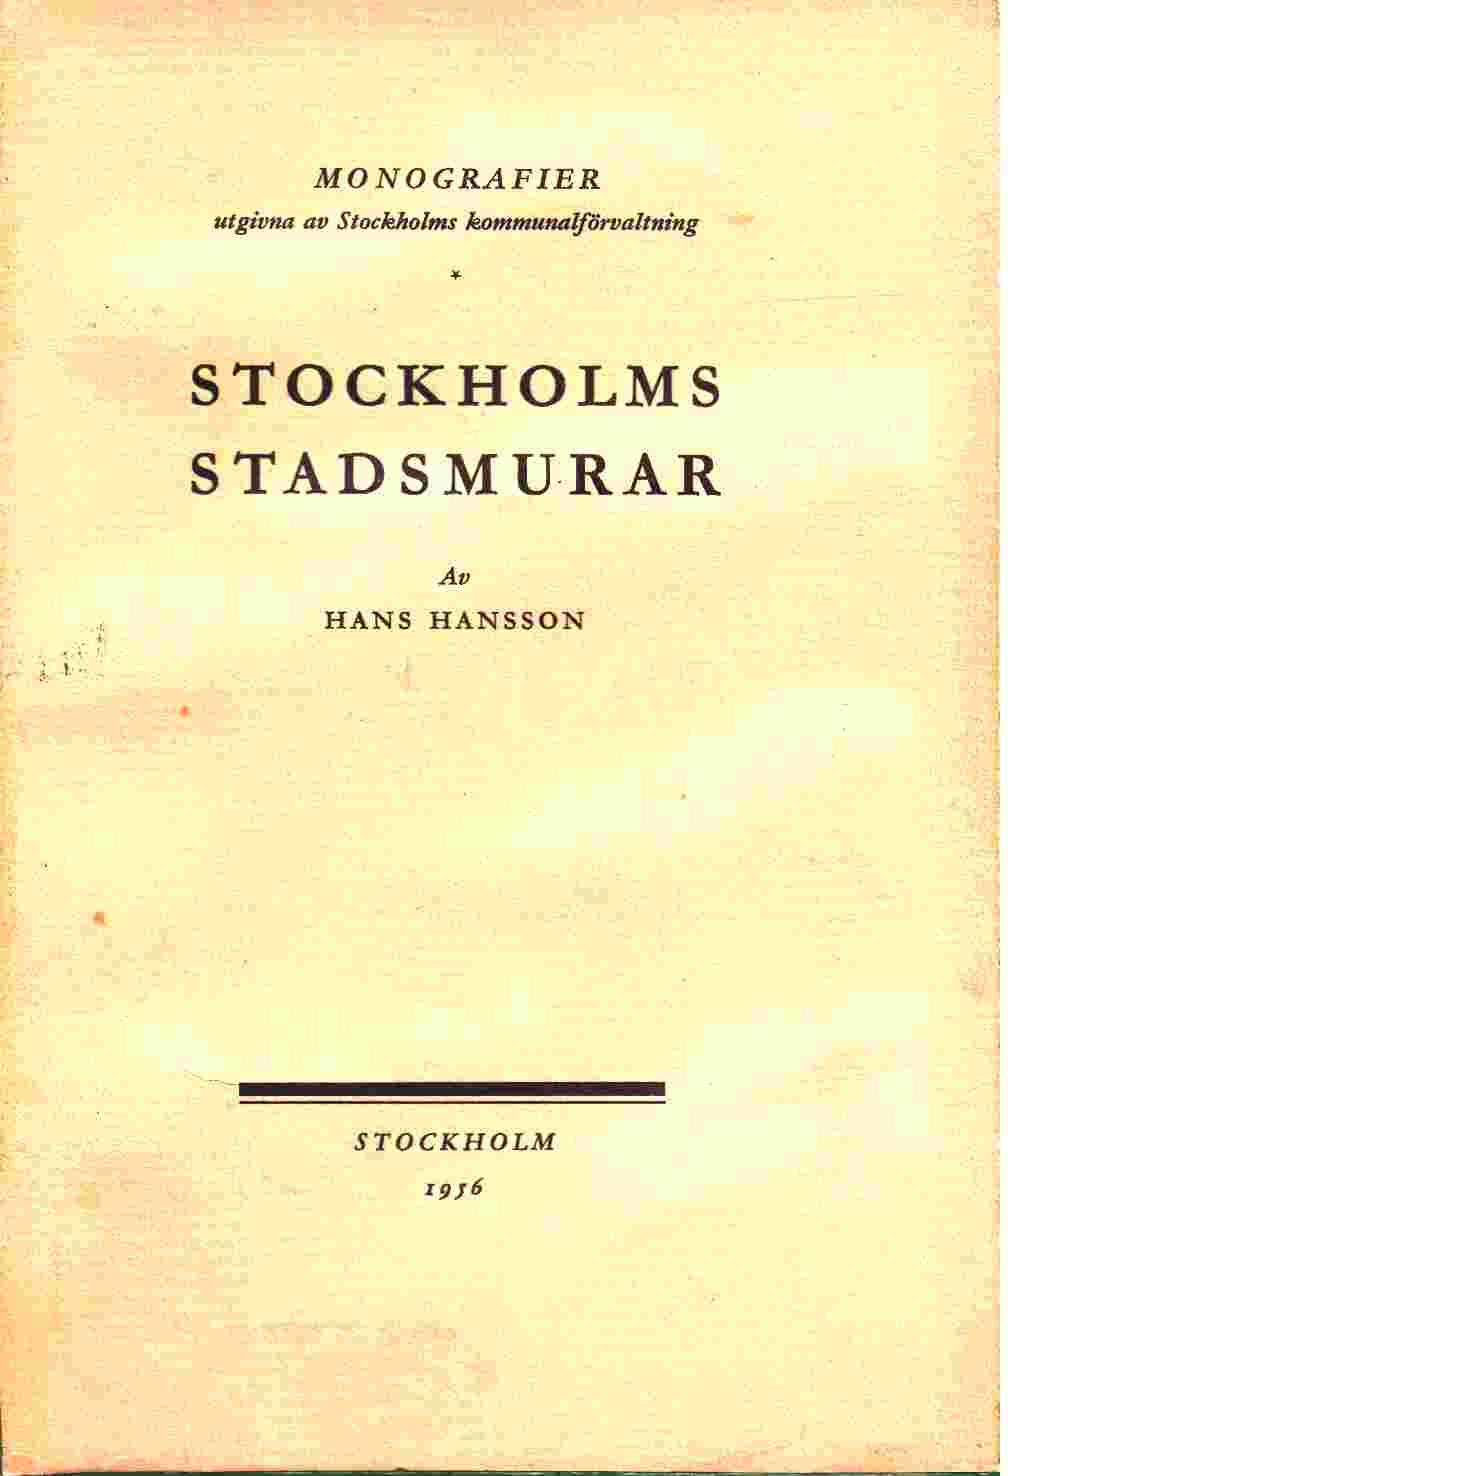 Stockholms Stadsmurar - Hansson, Hans